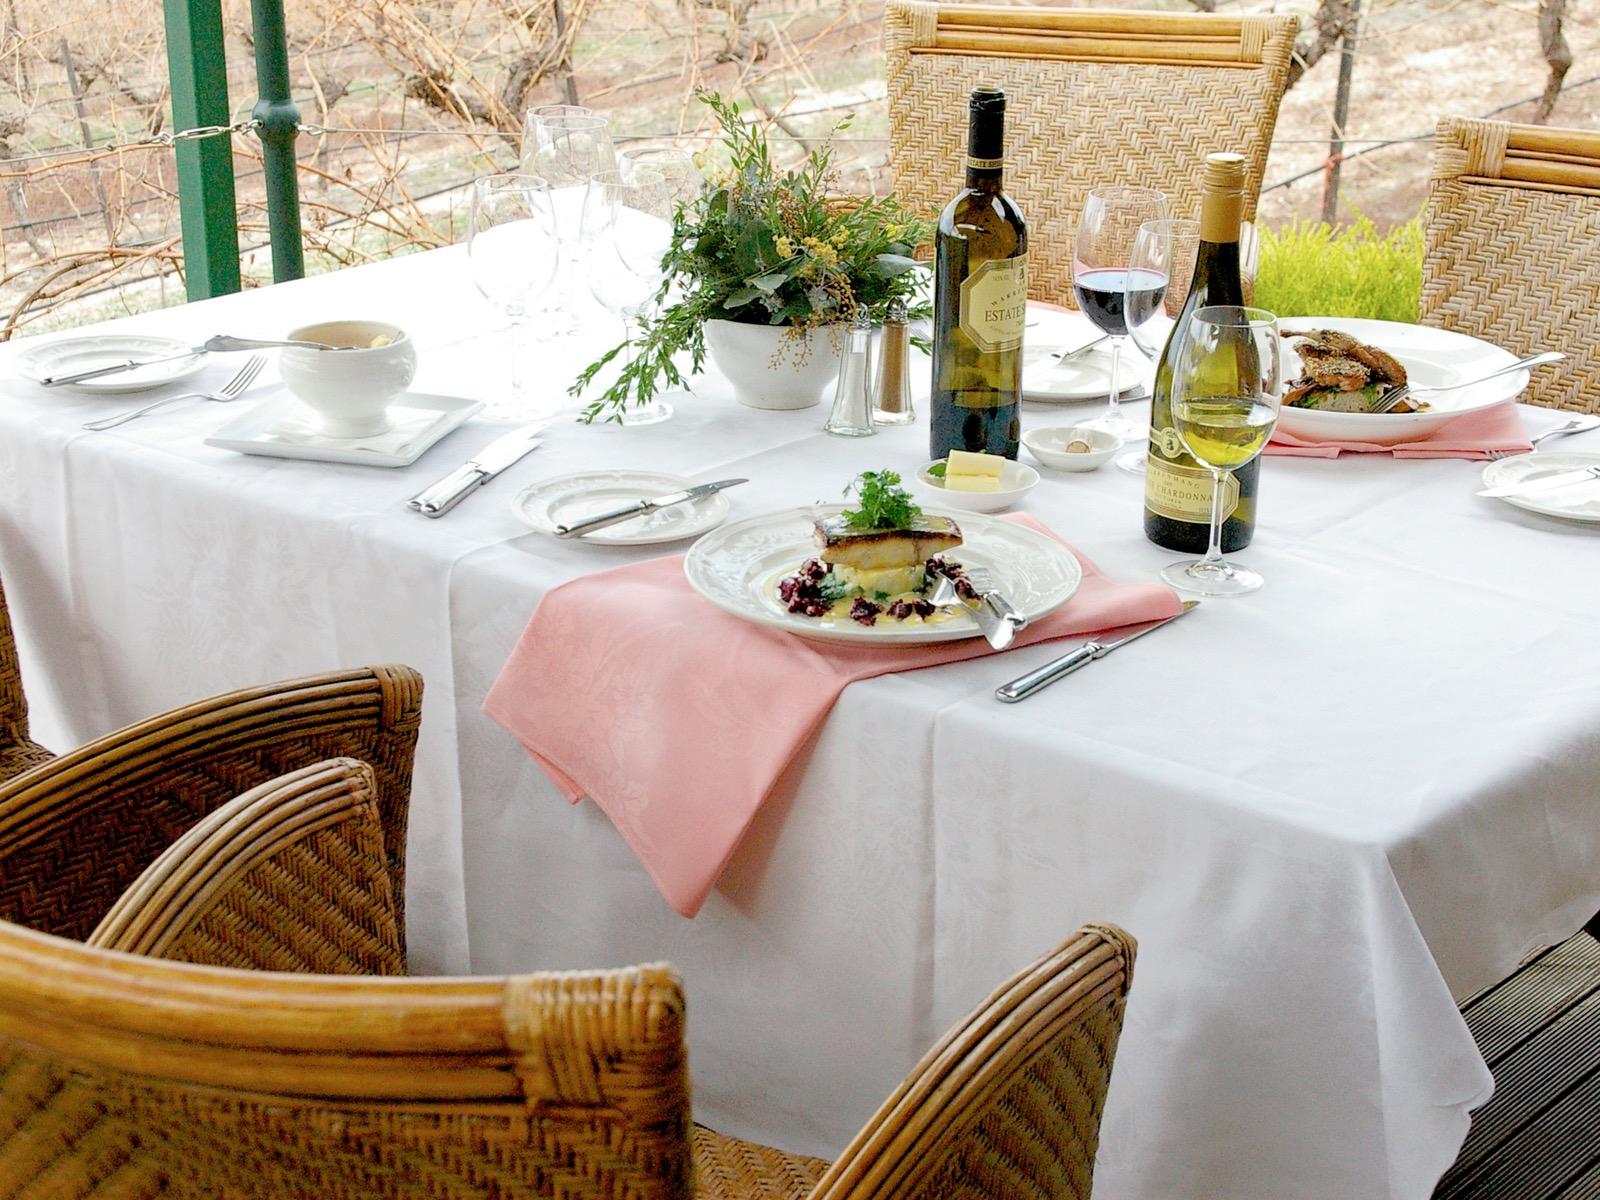 Al fresco dining on the deck